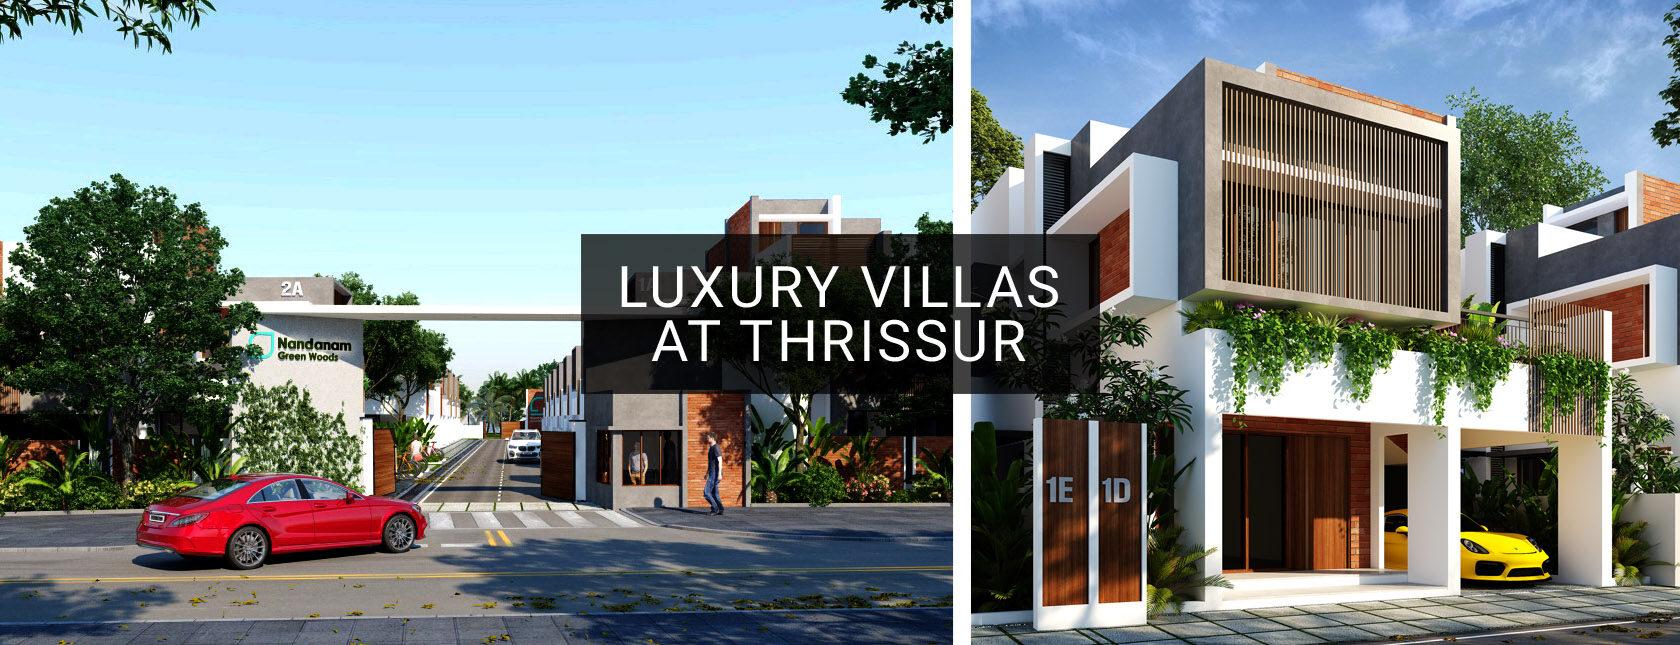 Villas at Thrissur